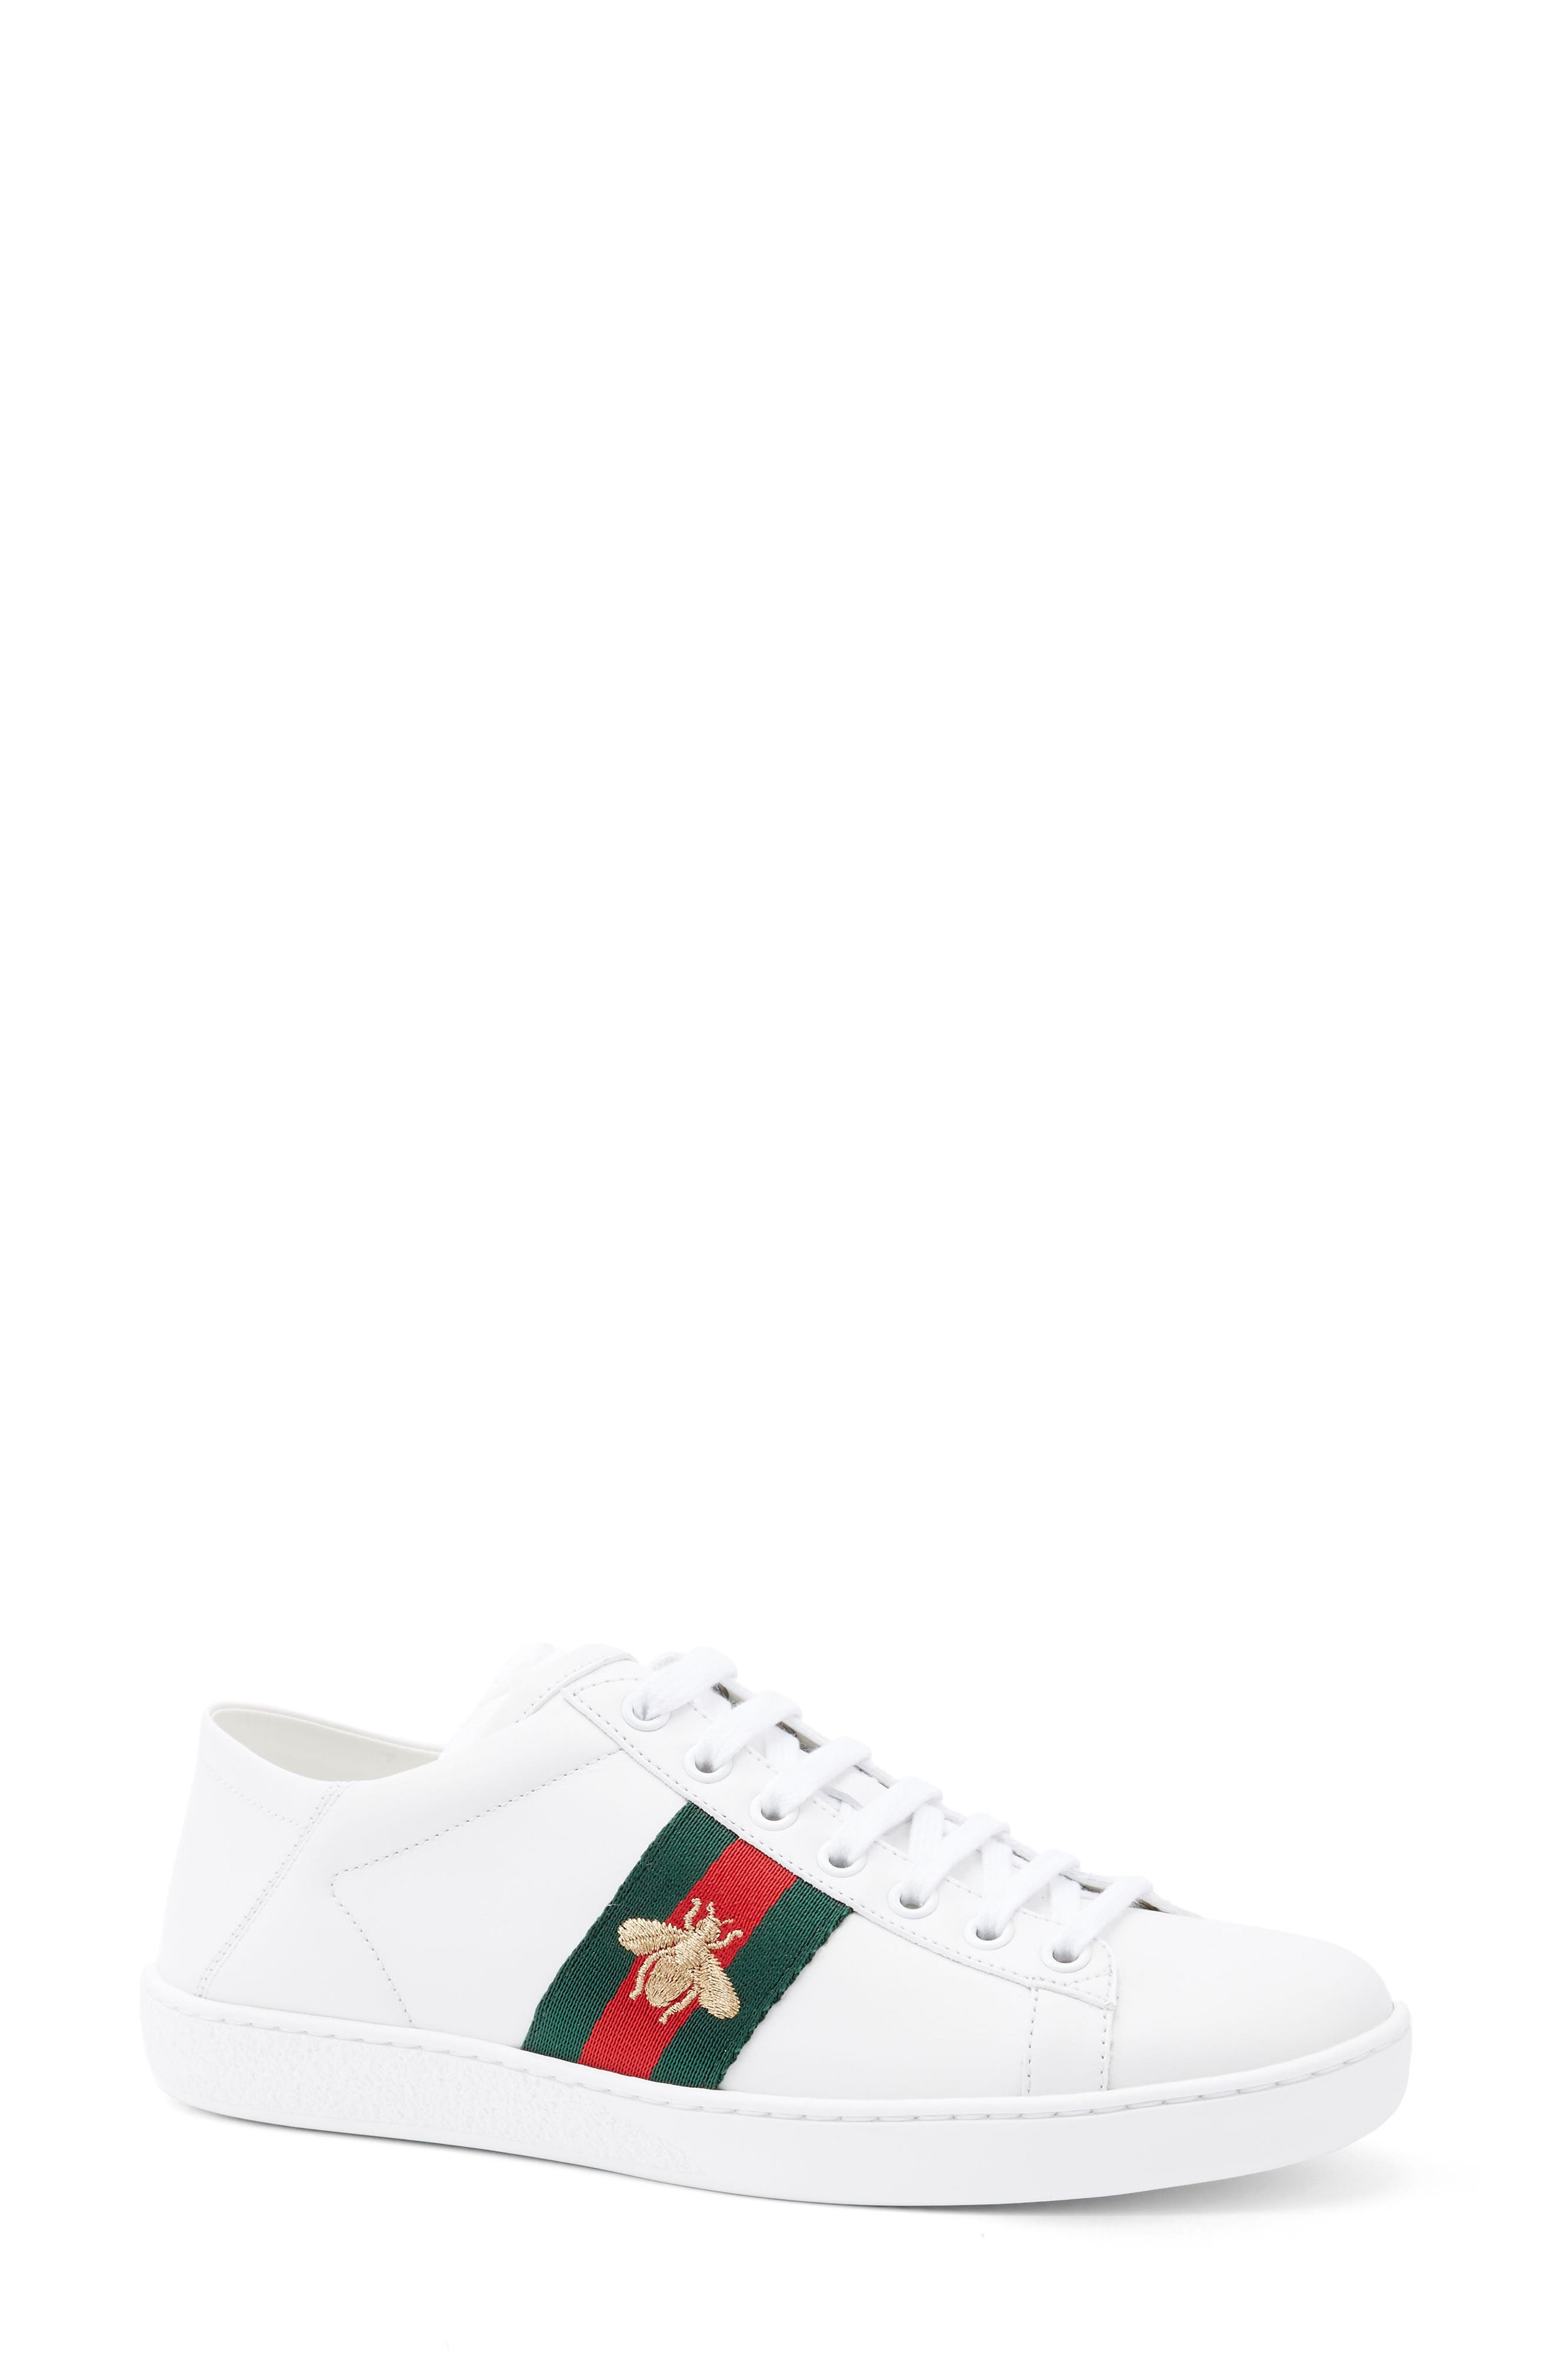 Main Image - Gucci New Ace Convertible Heel Sneaker (Women)